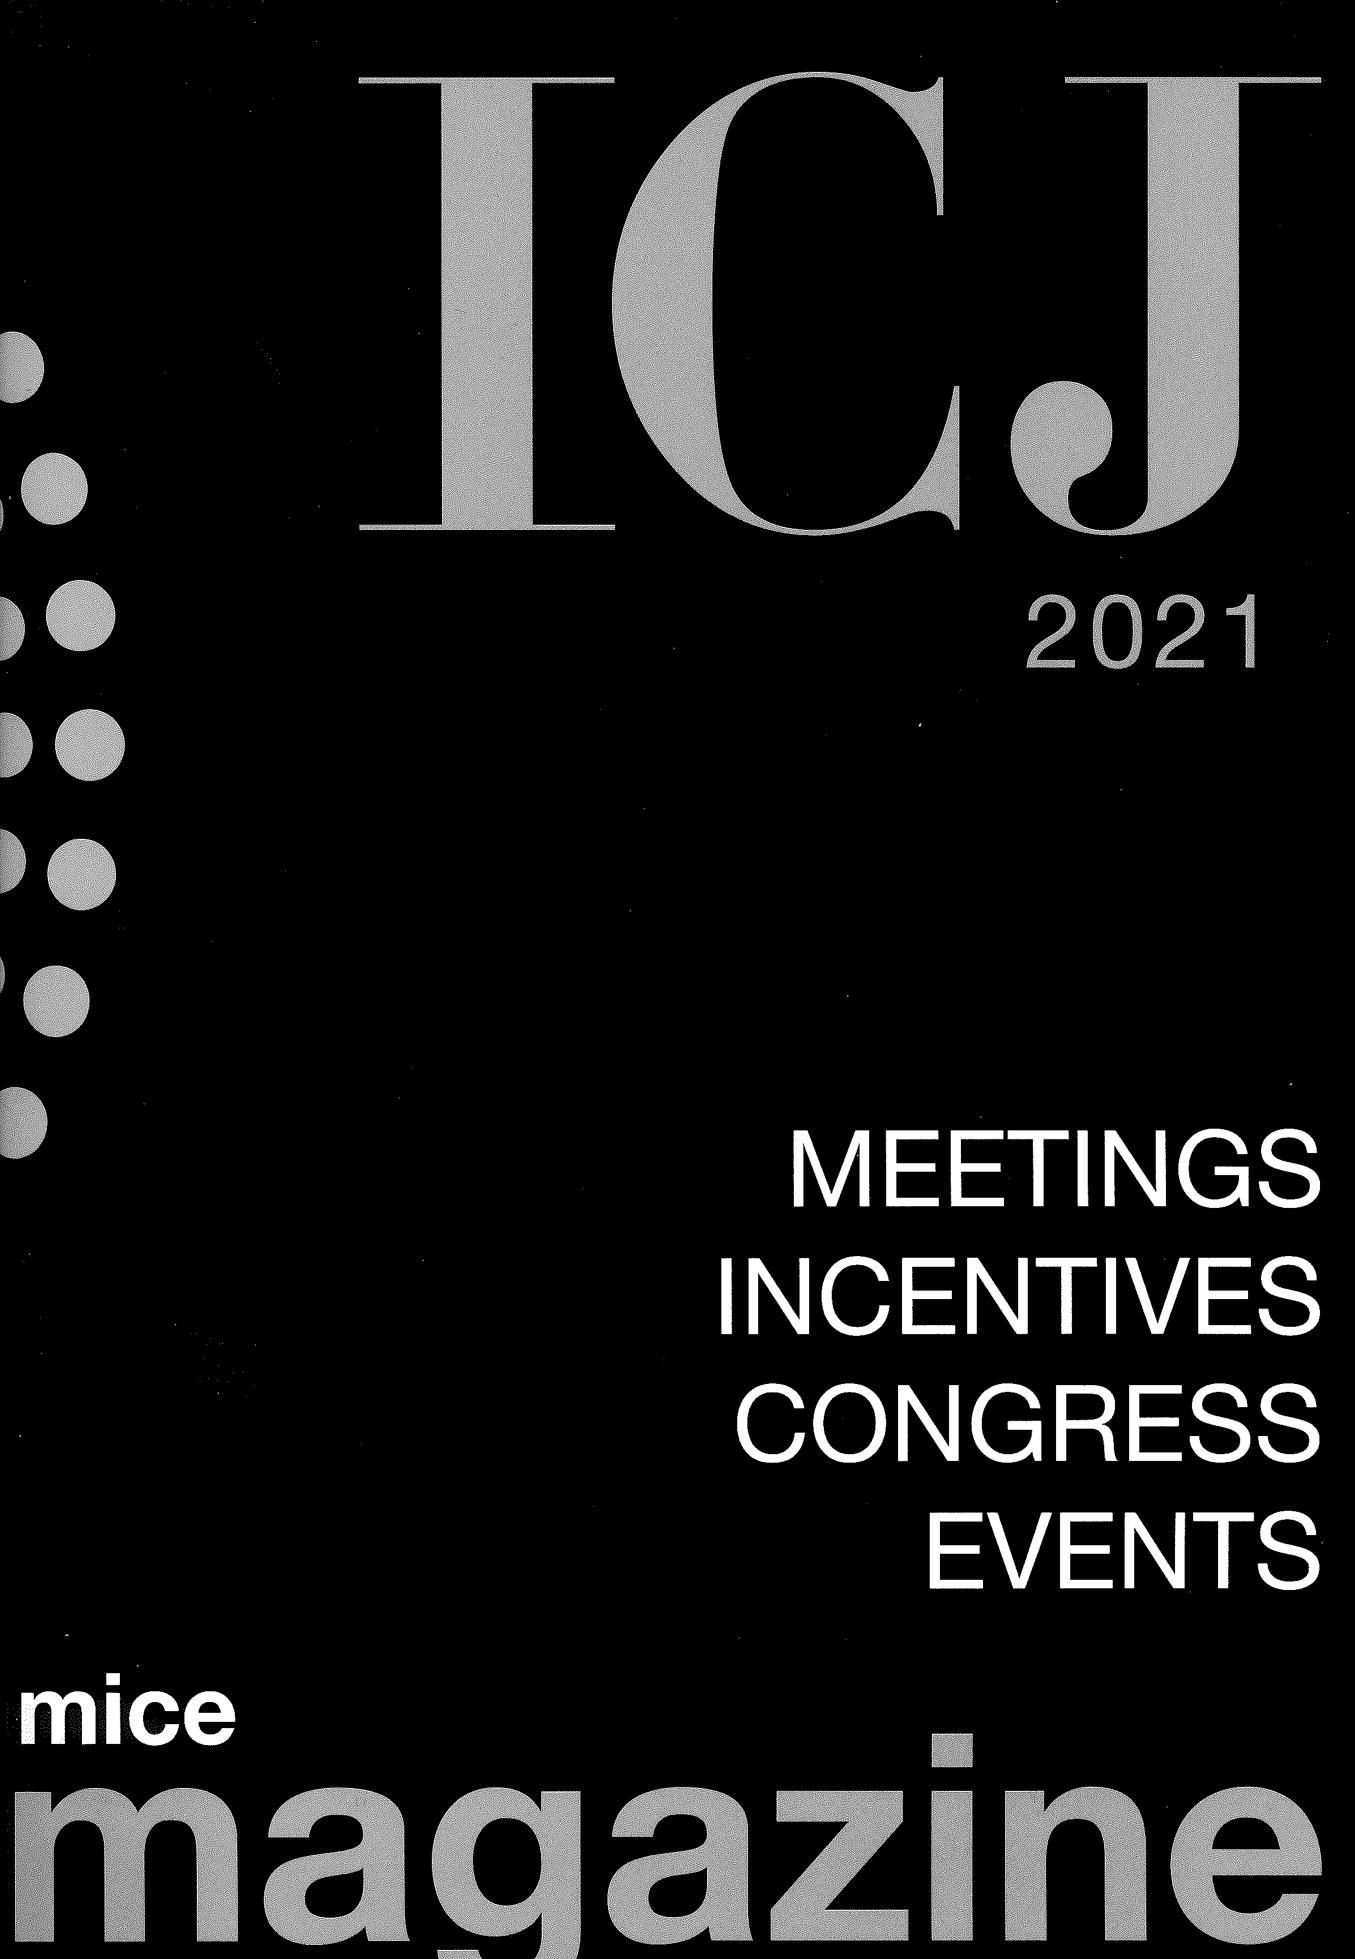 Edgar Itt Speaker experts4events ICJ advantage